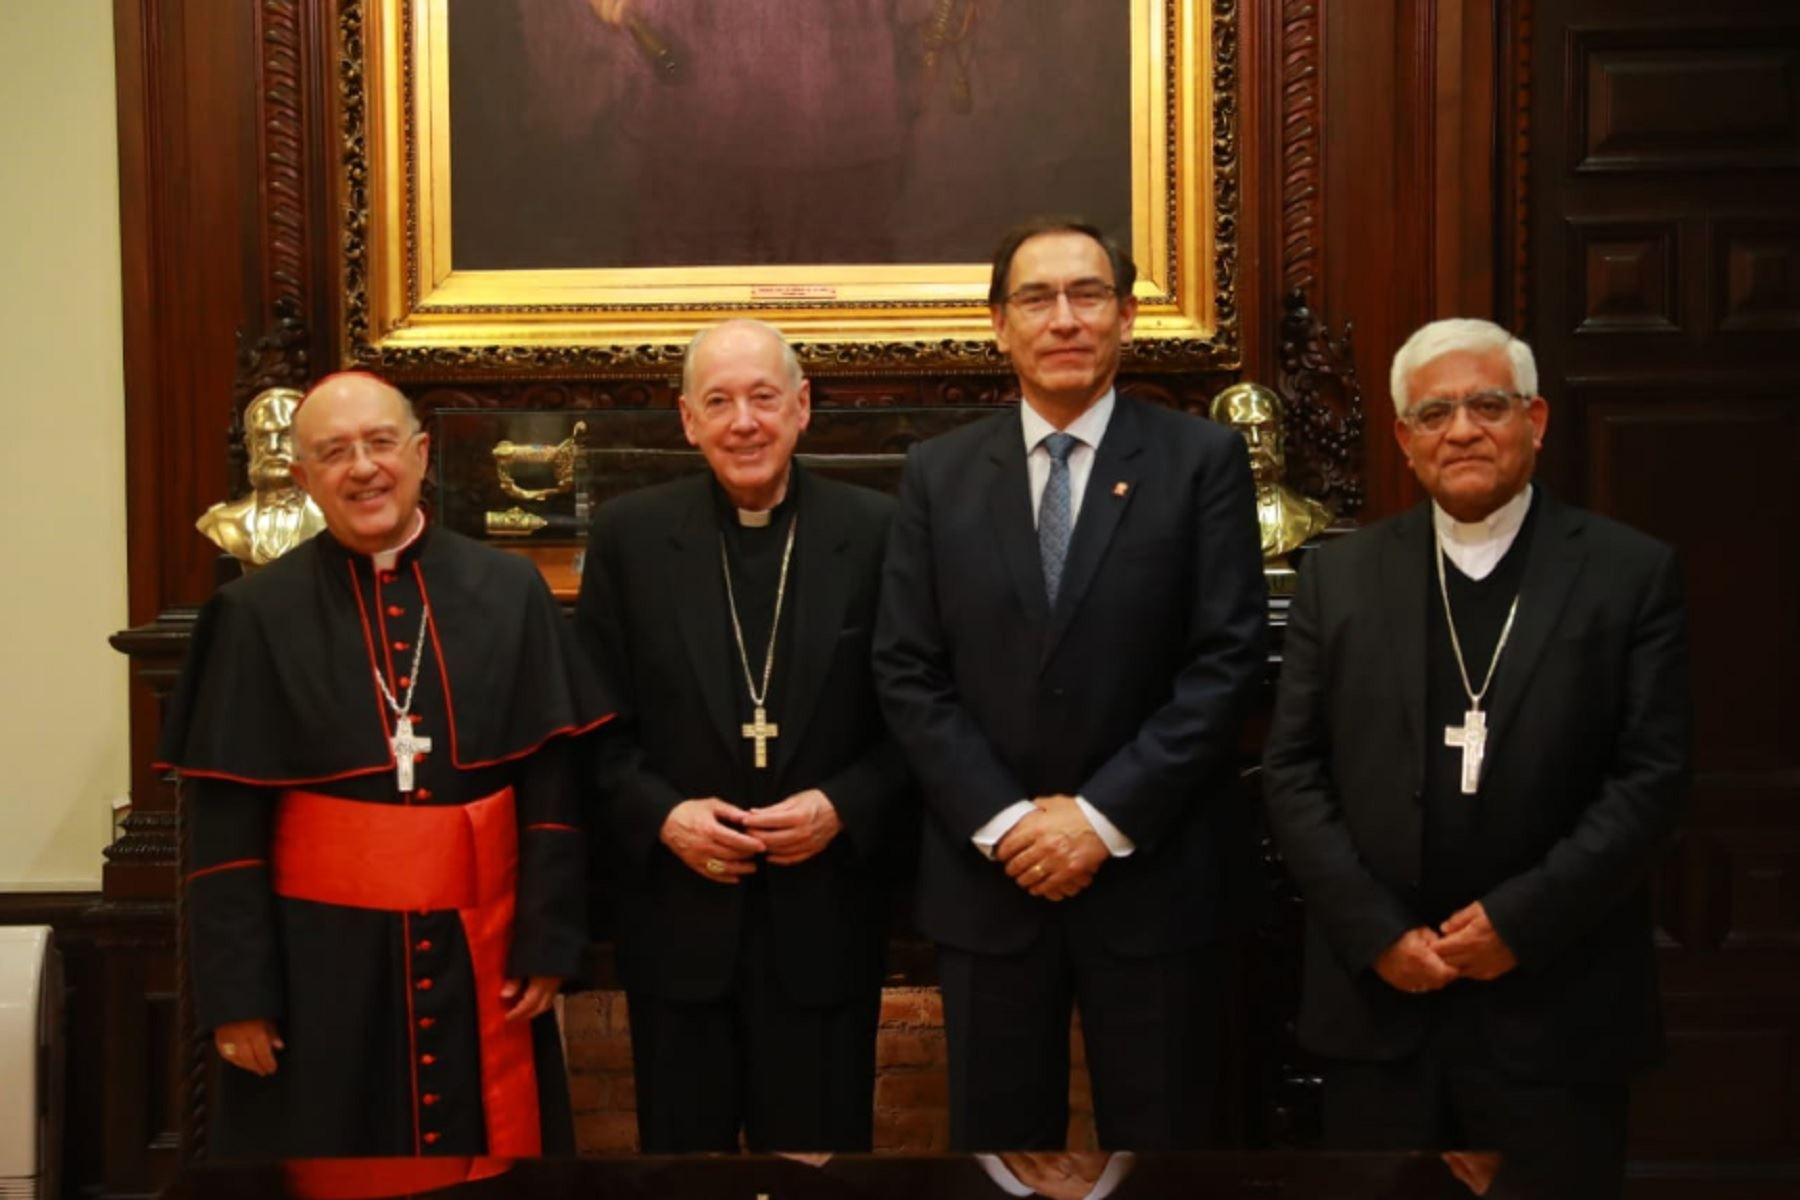 Presidente Martín Vizcarra se reunió con representantes de la Iglesia Católica